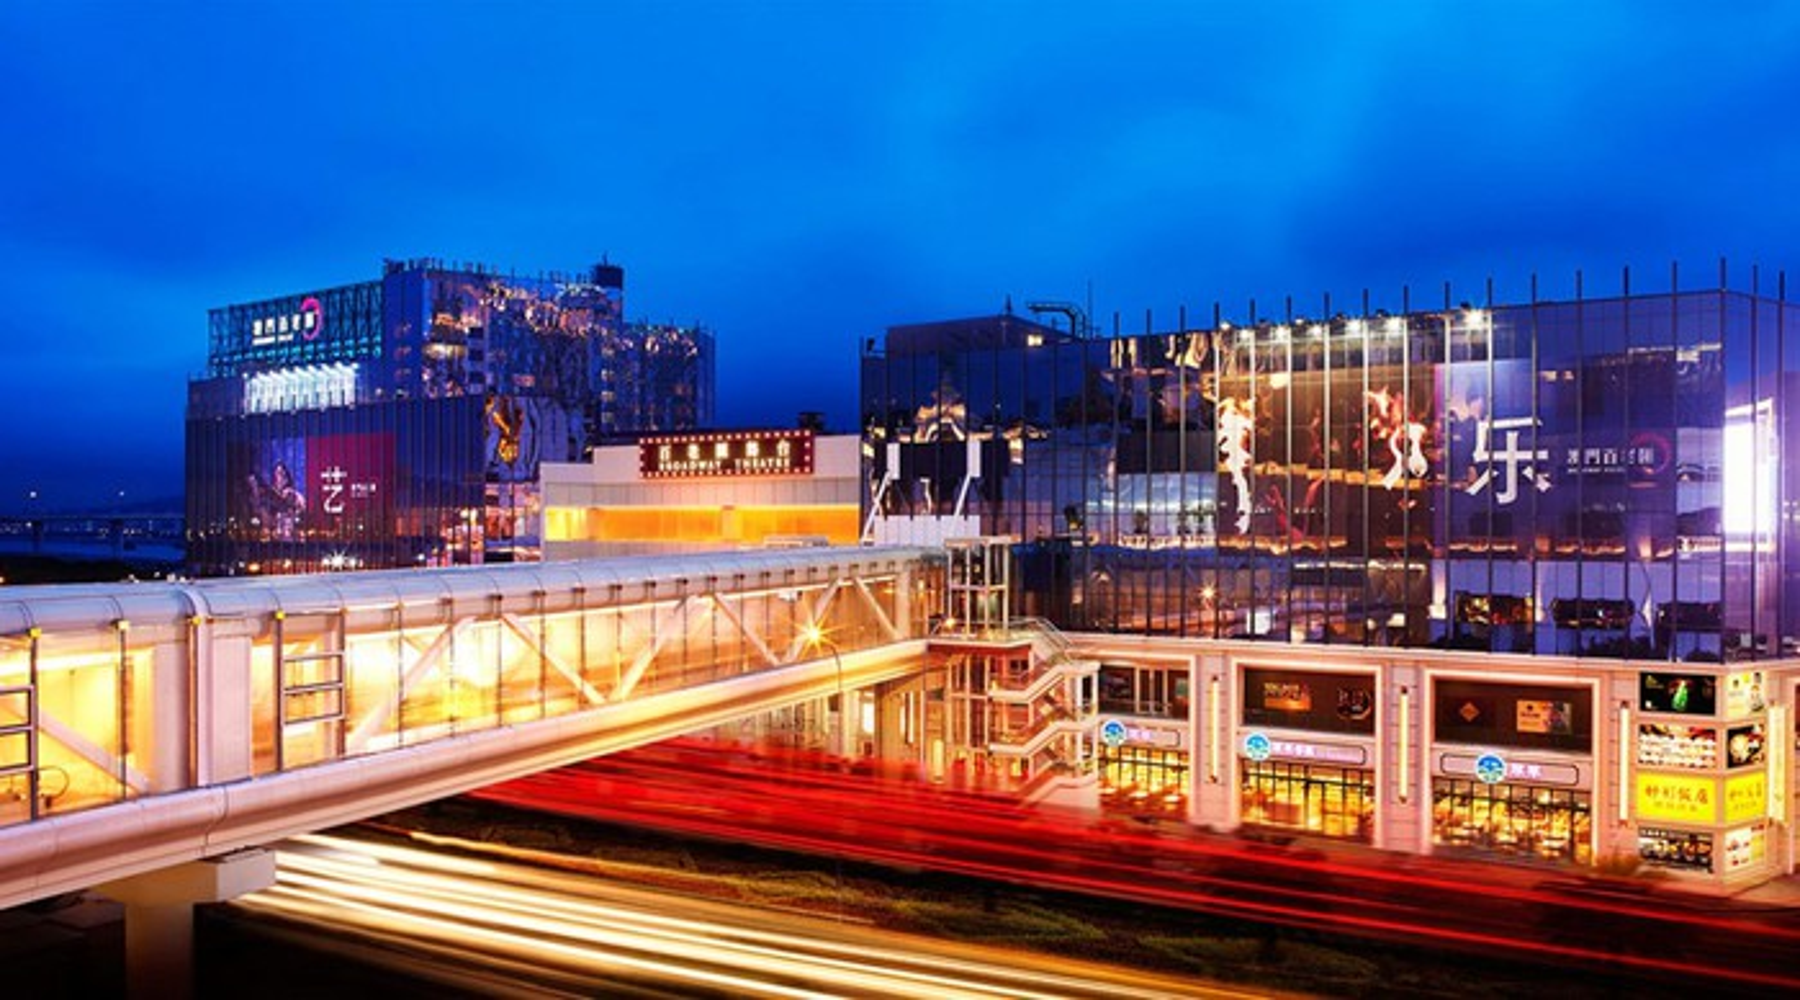 Galaxy Entertainment's Broadway Macau resort